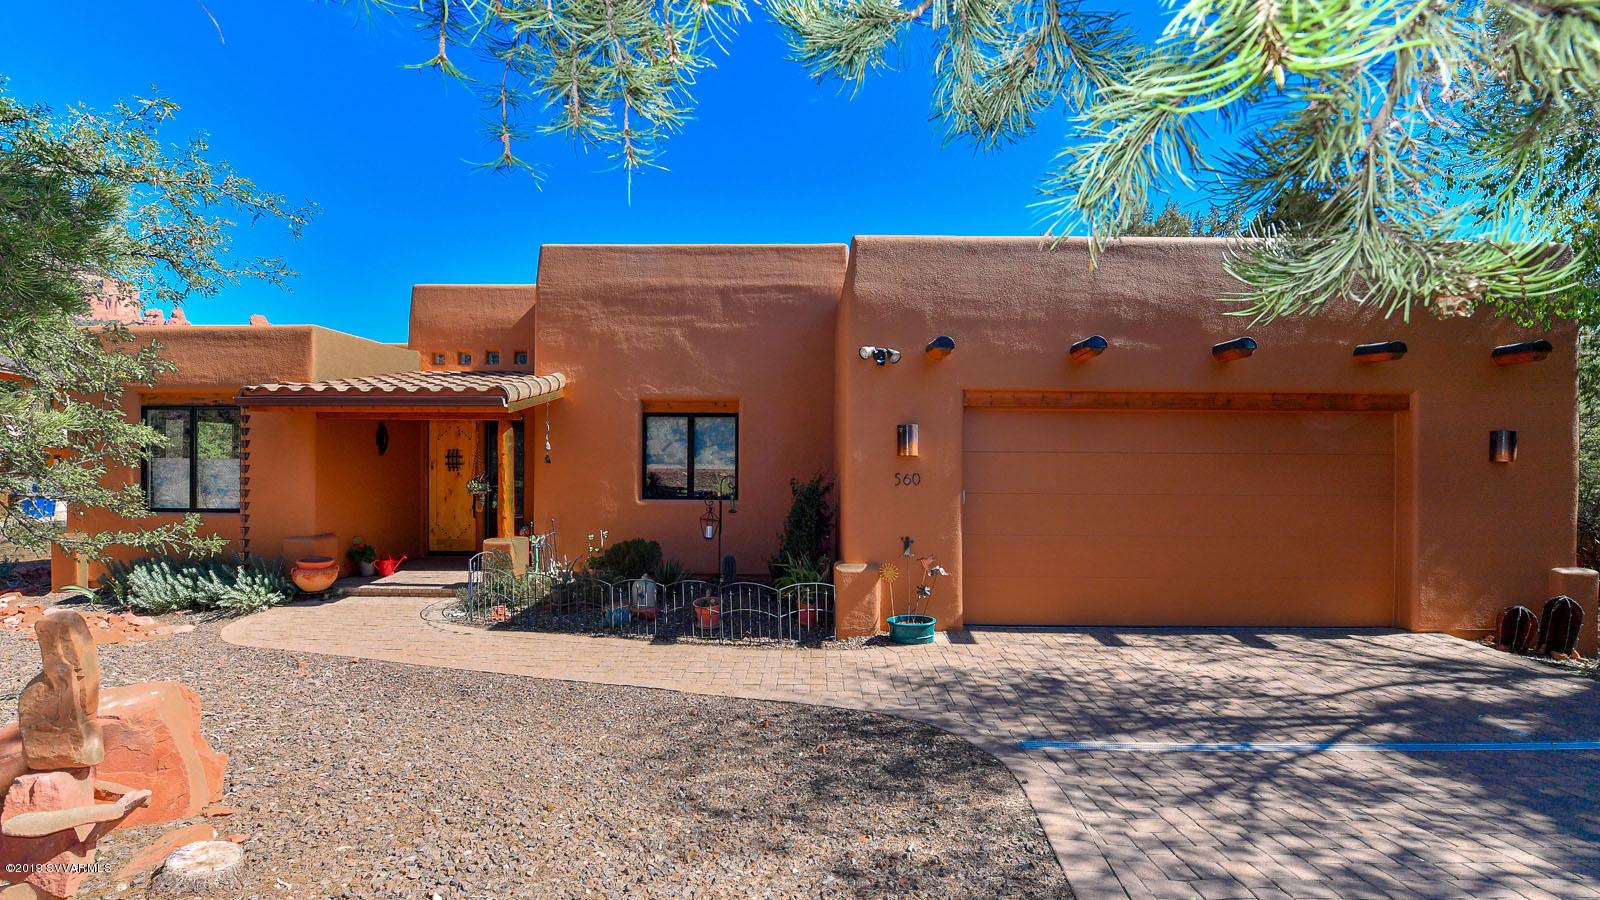 560 Schnebly Rd Sedona, AZ 86336